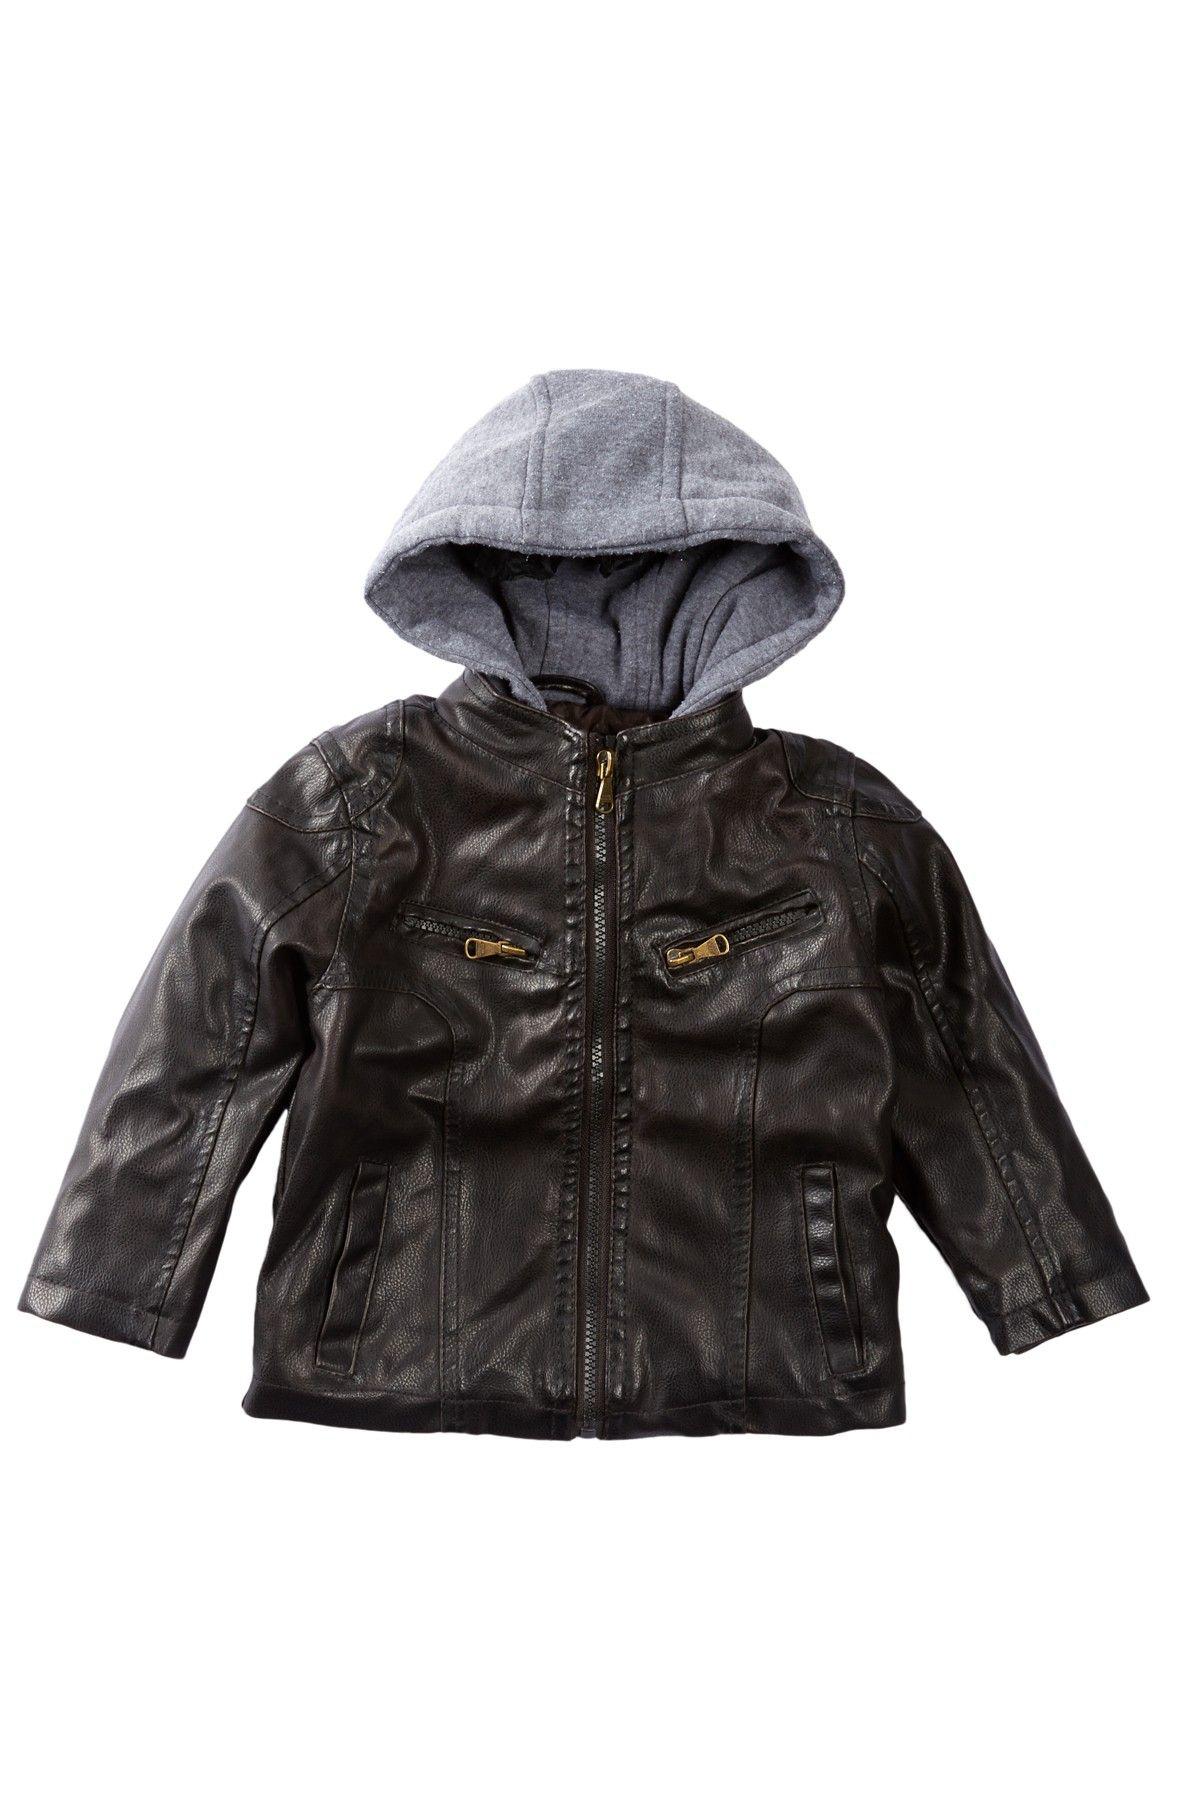 Urban Republic Faux Leather Moto Jacket with Fleece Hood